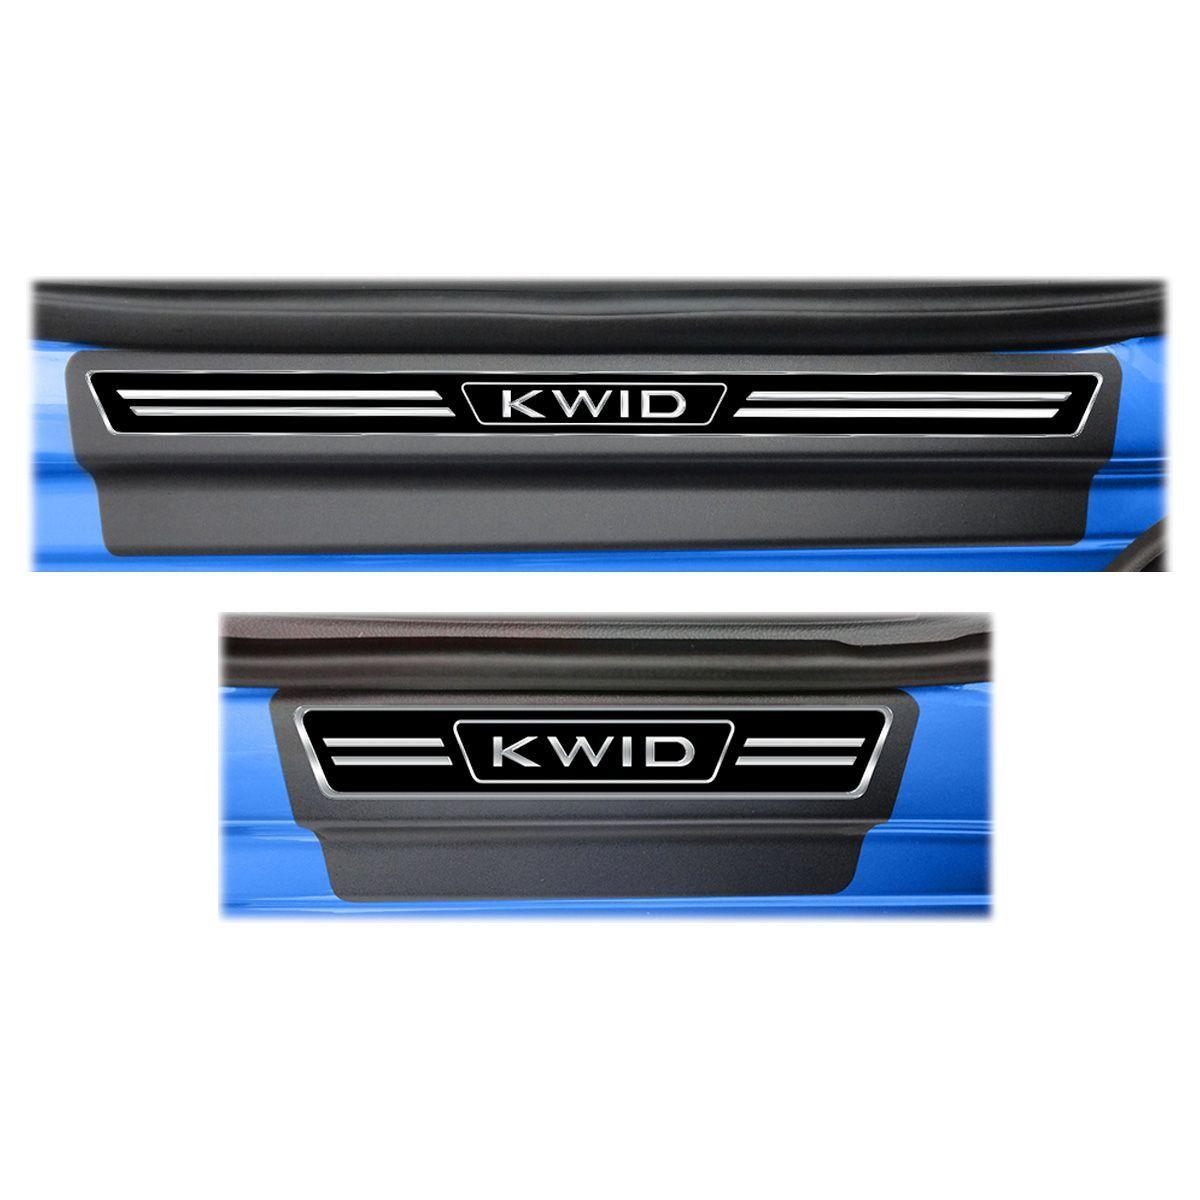 Soleira Porta Kwid Resinada Premium Elegance